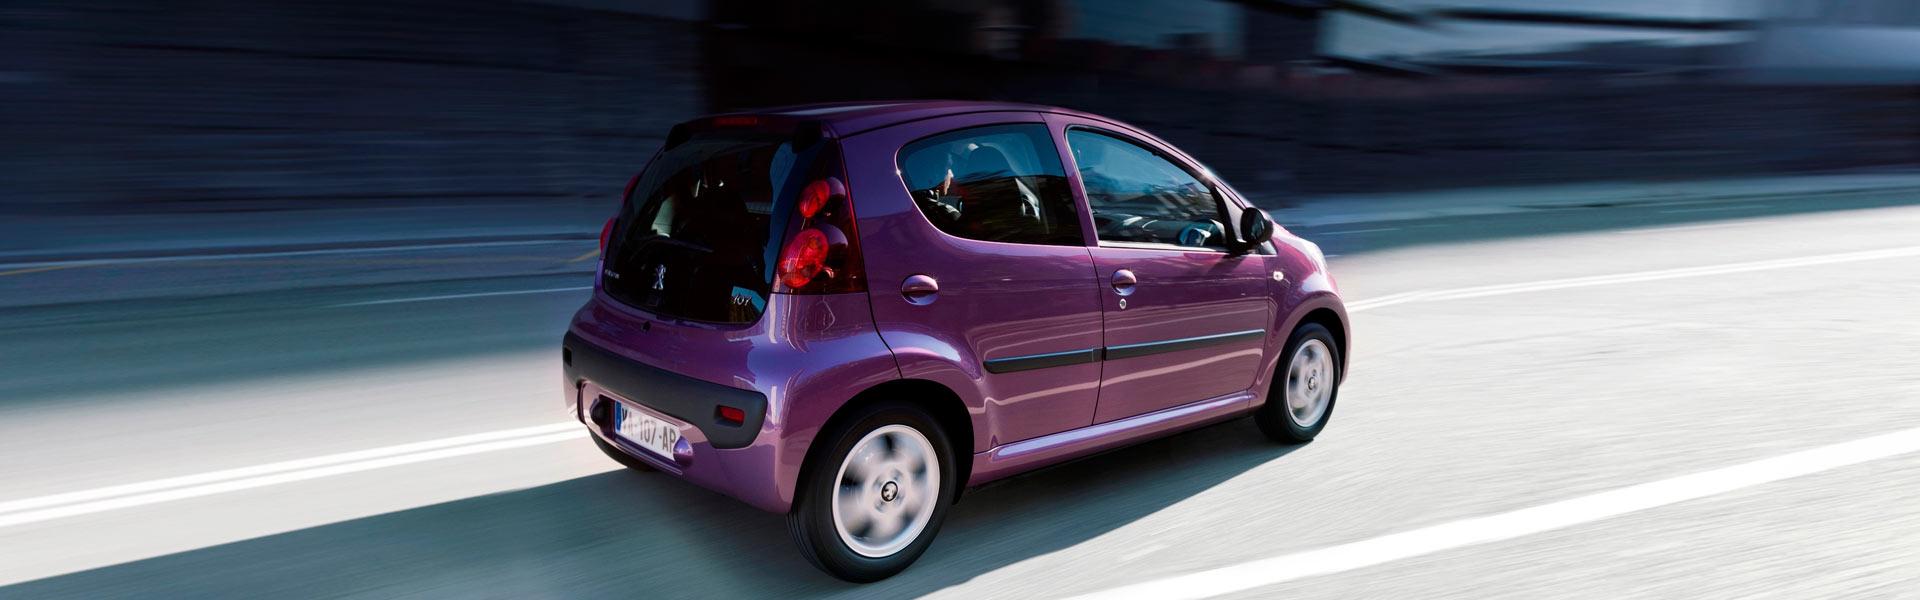 Сервис Peugeot 107